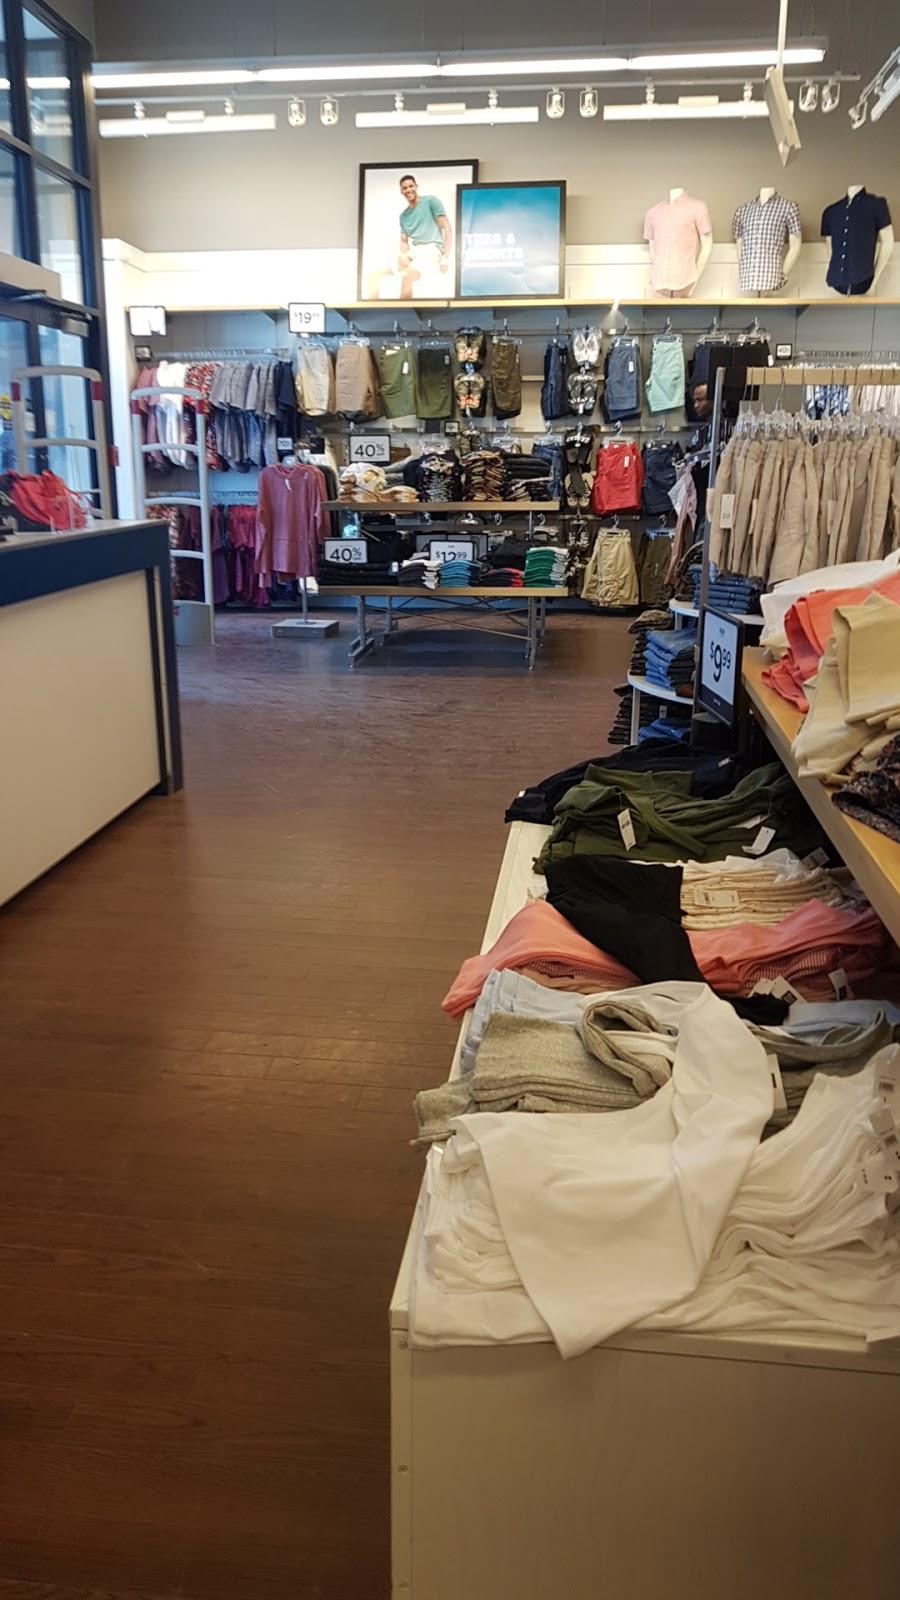 Gap Outlet | clothing store | 1718 Preston Ave N, Saskatoon, SK S7N 4Y1, Canada | 3069319711 OR +1 306-931-9711